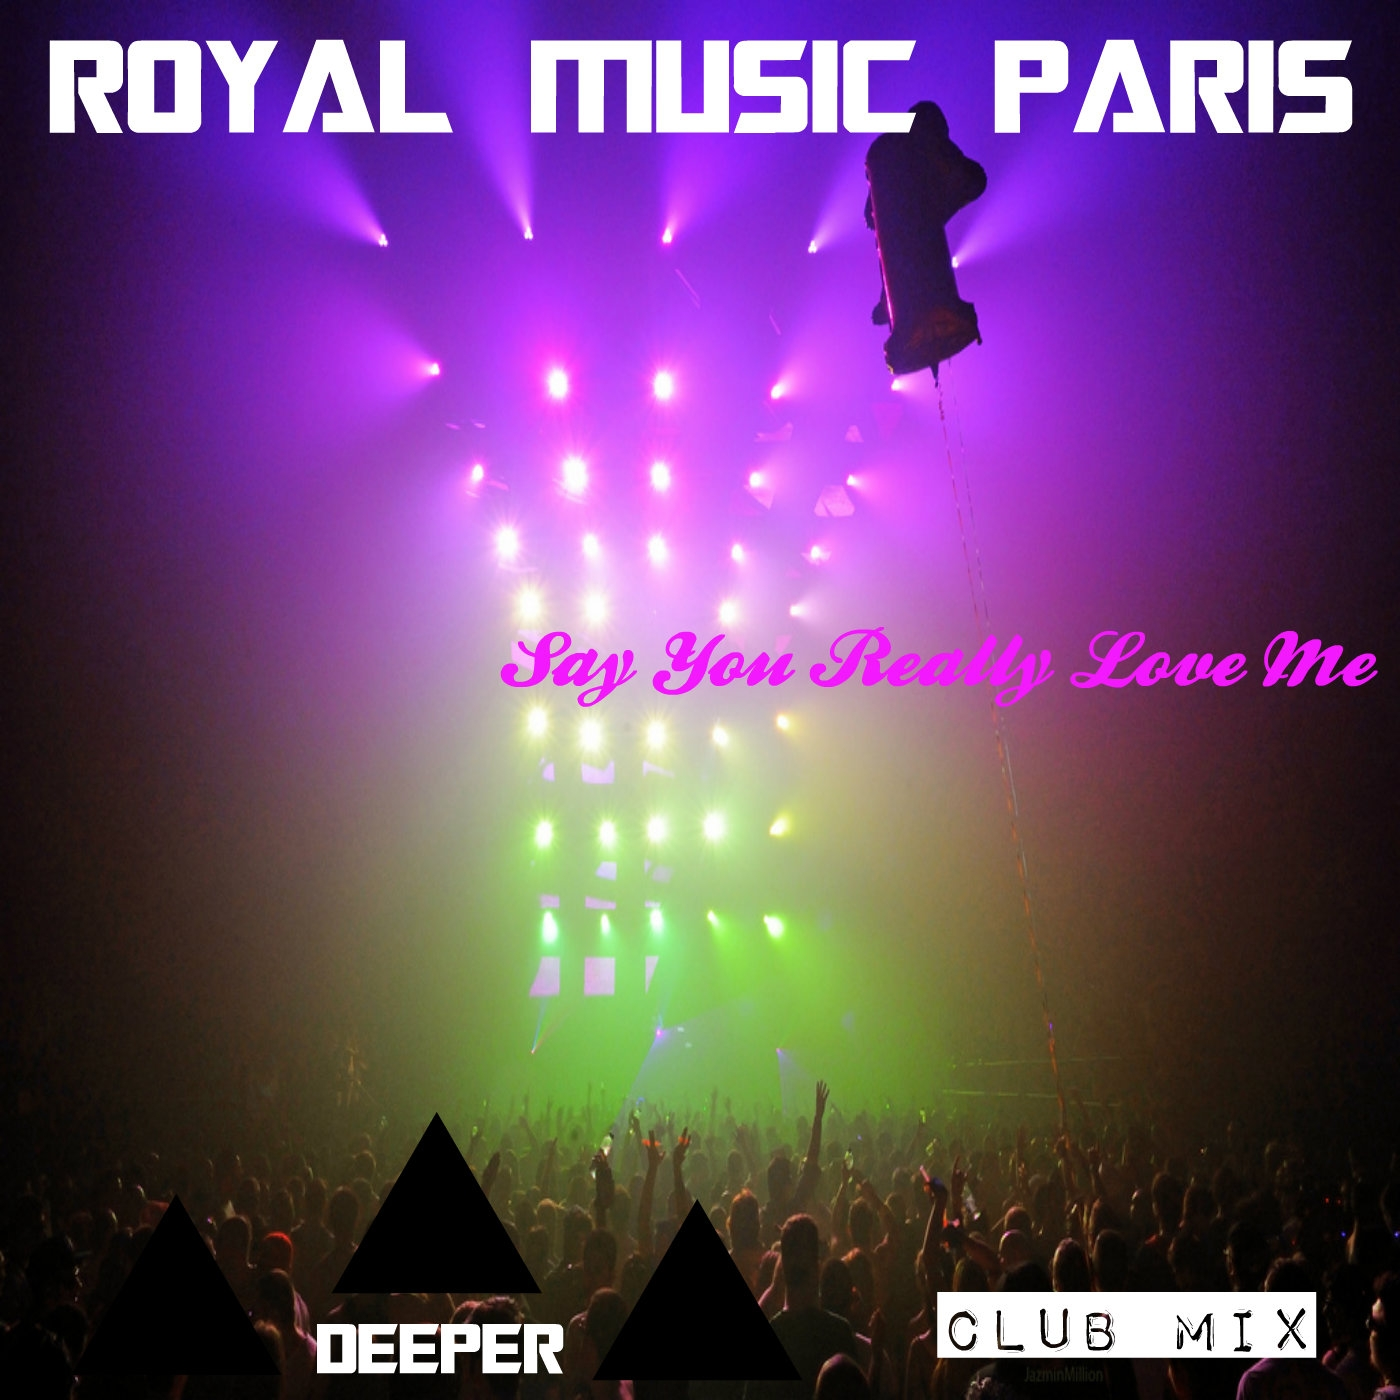 Royal Music Paris - Say You Really Want Me (Future House Mix)